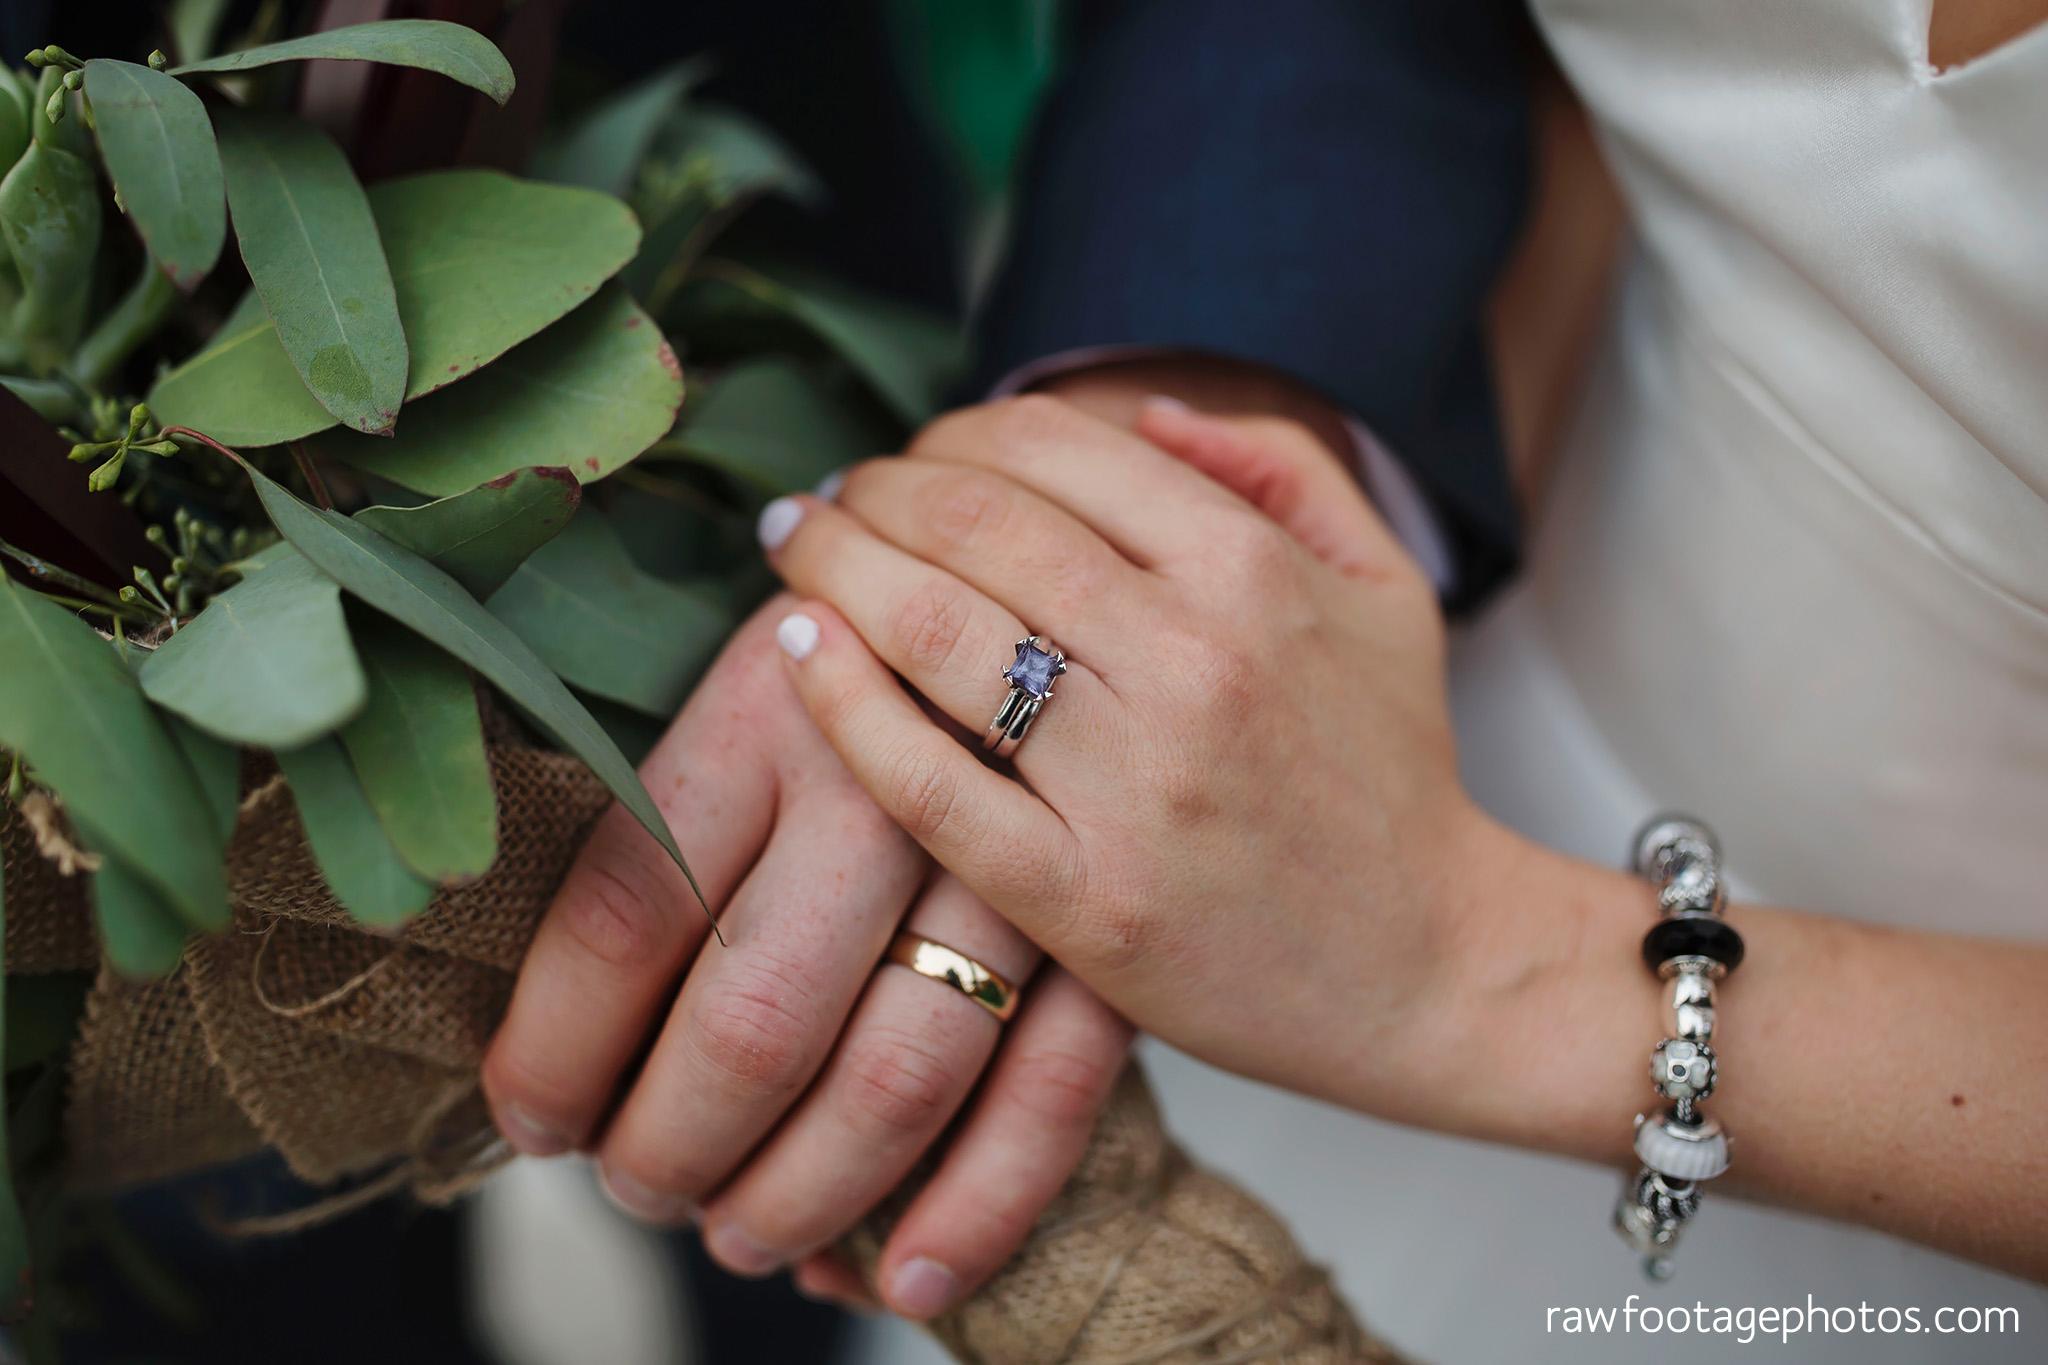 london_ontario_wedding_photographer-civic_gardens-springbank_park-succulent_bouquet-fall_wedding-bridge-raw_footage_photography075.jpg